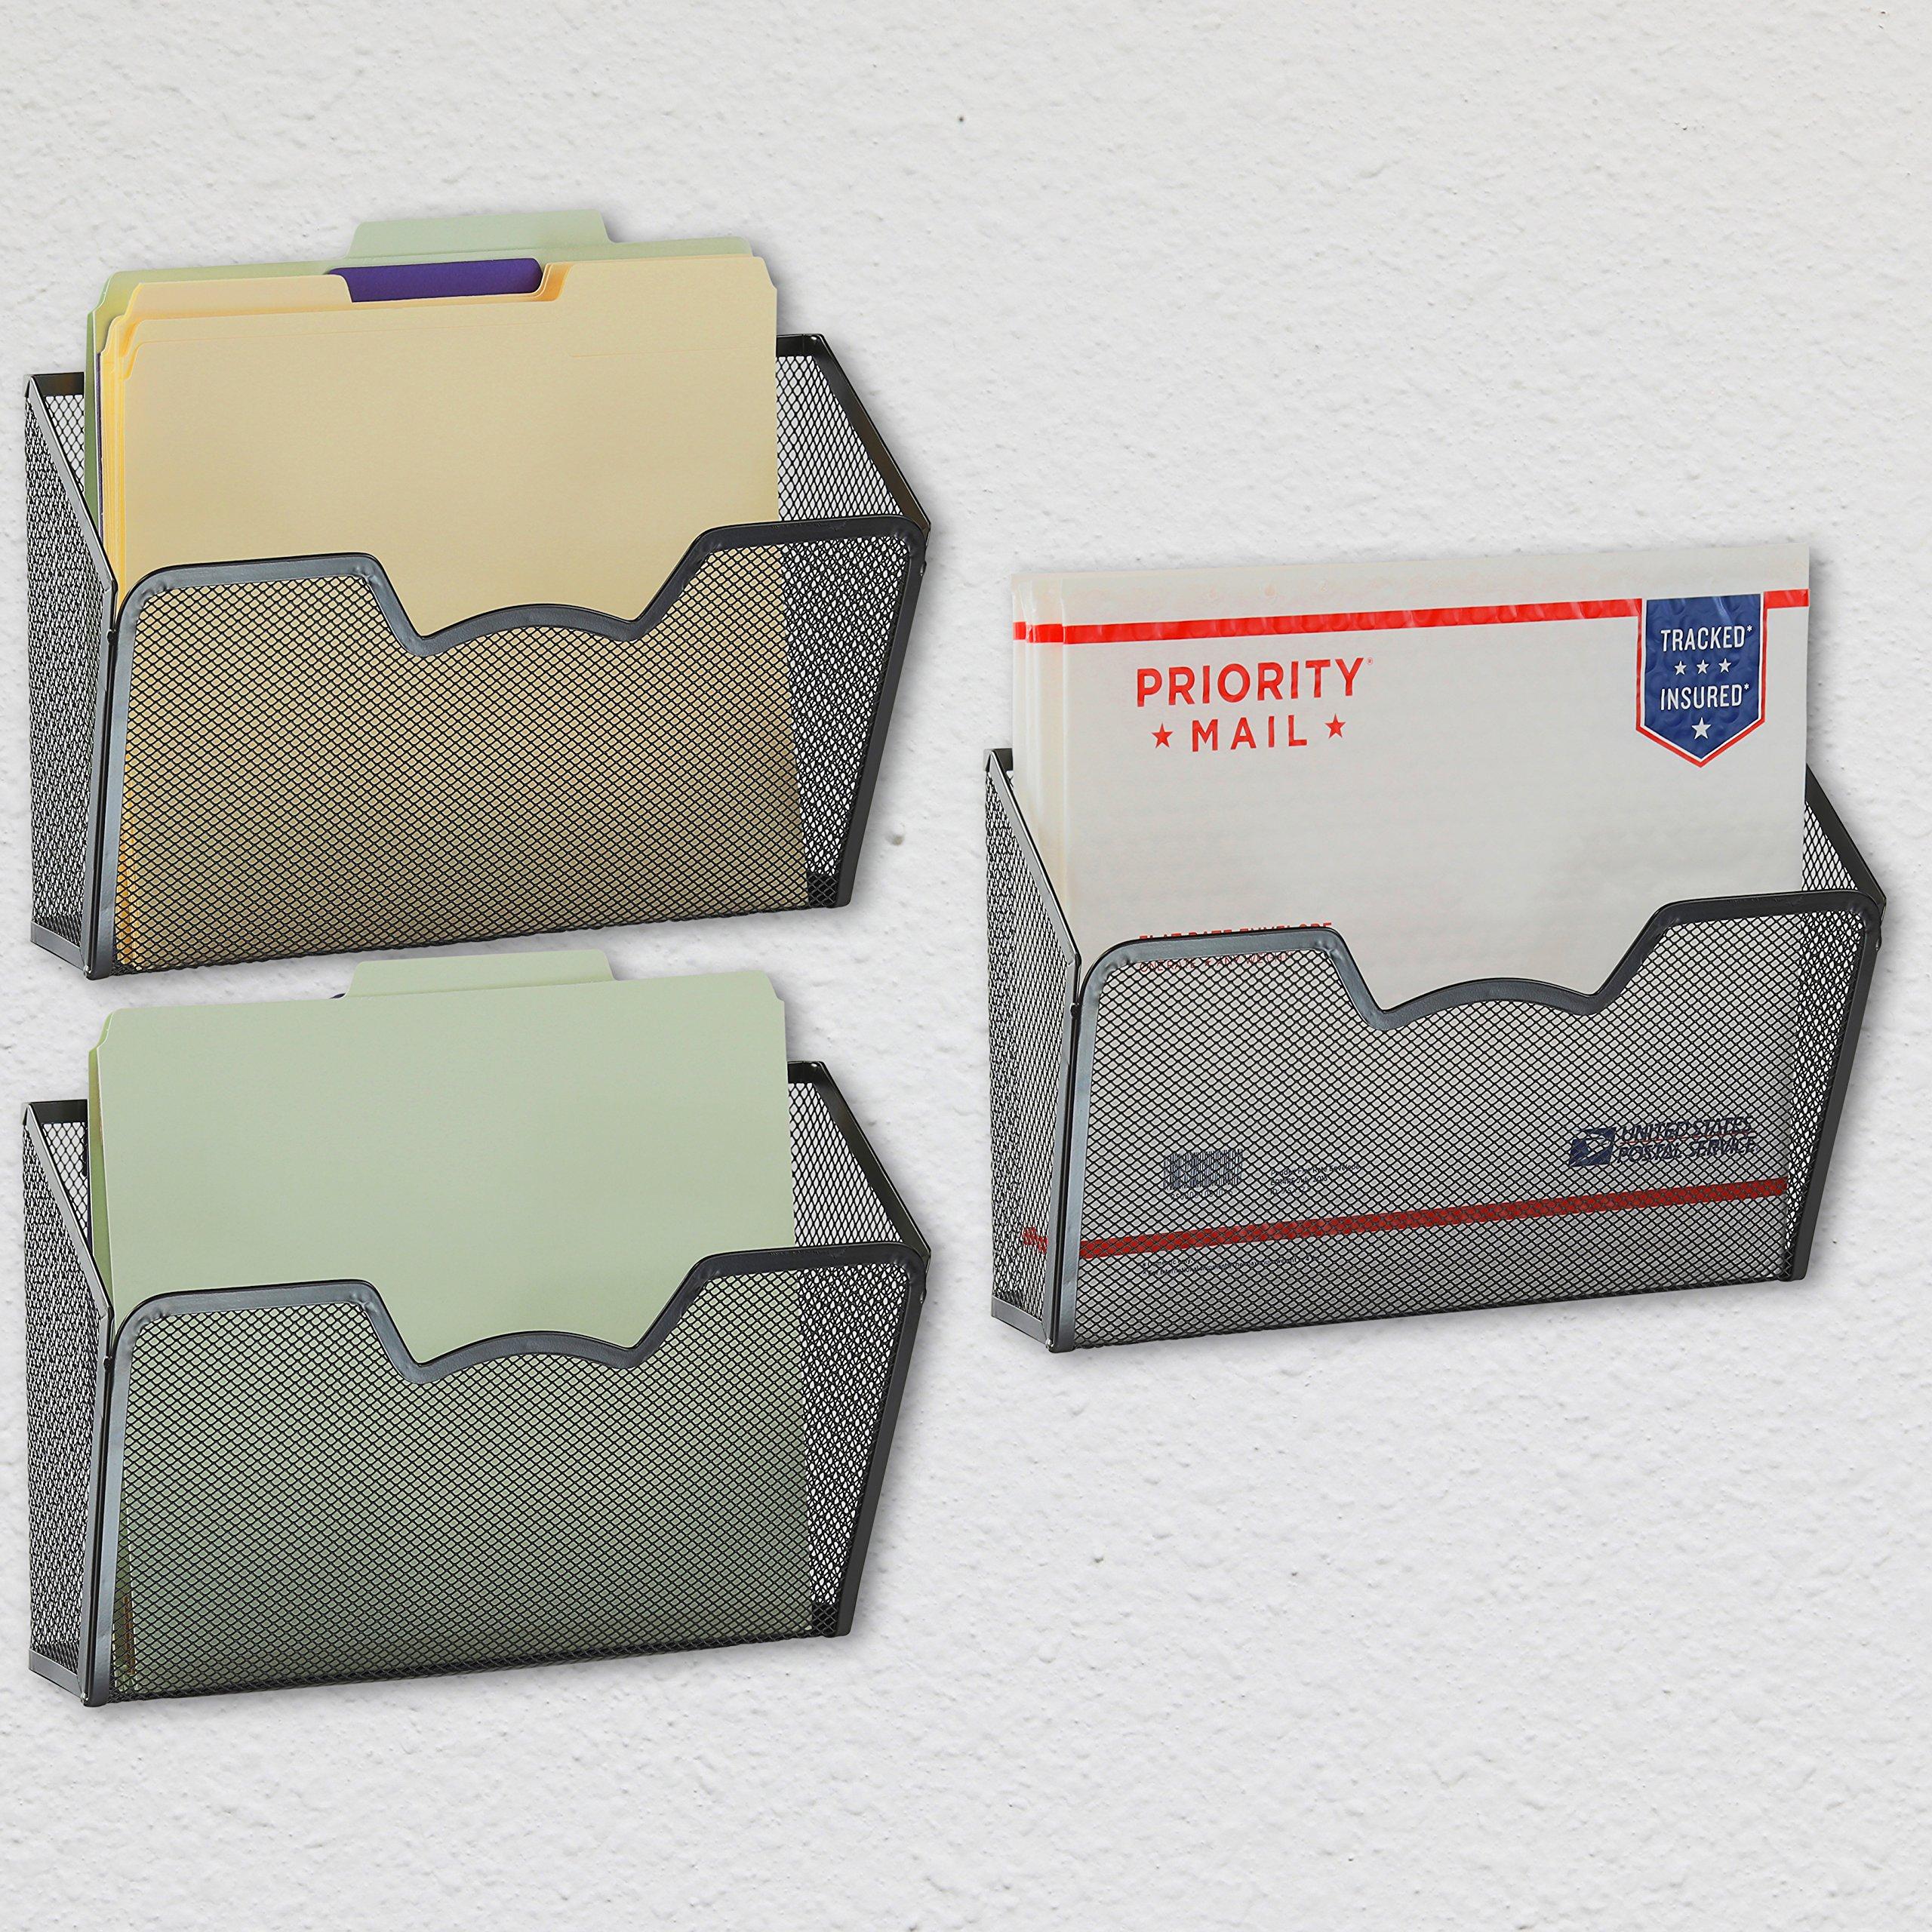 3 Pack - SimpleHouseware Wall Mount Single Pocket File Organizer Holder, Black by Simple Houseware